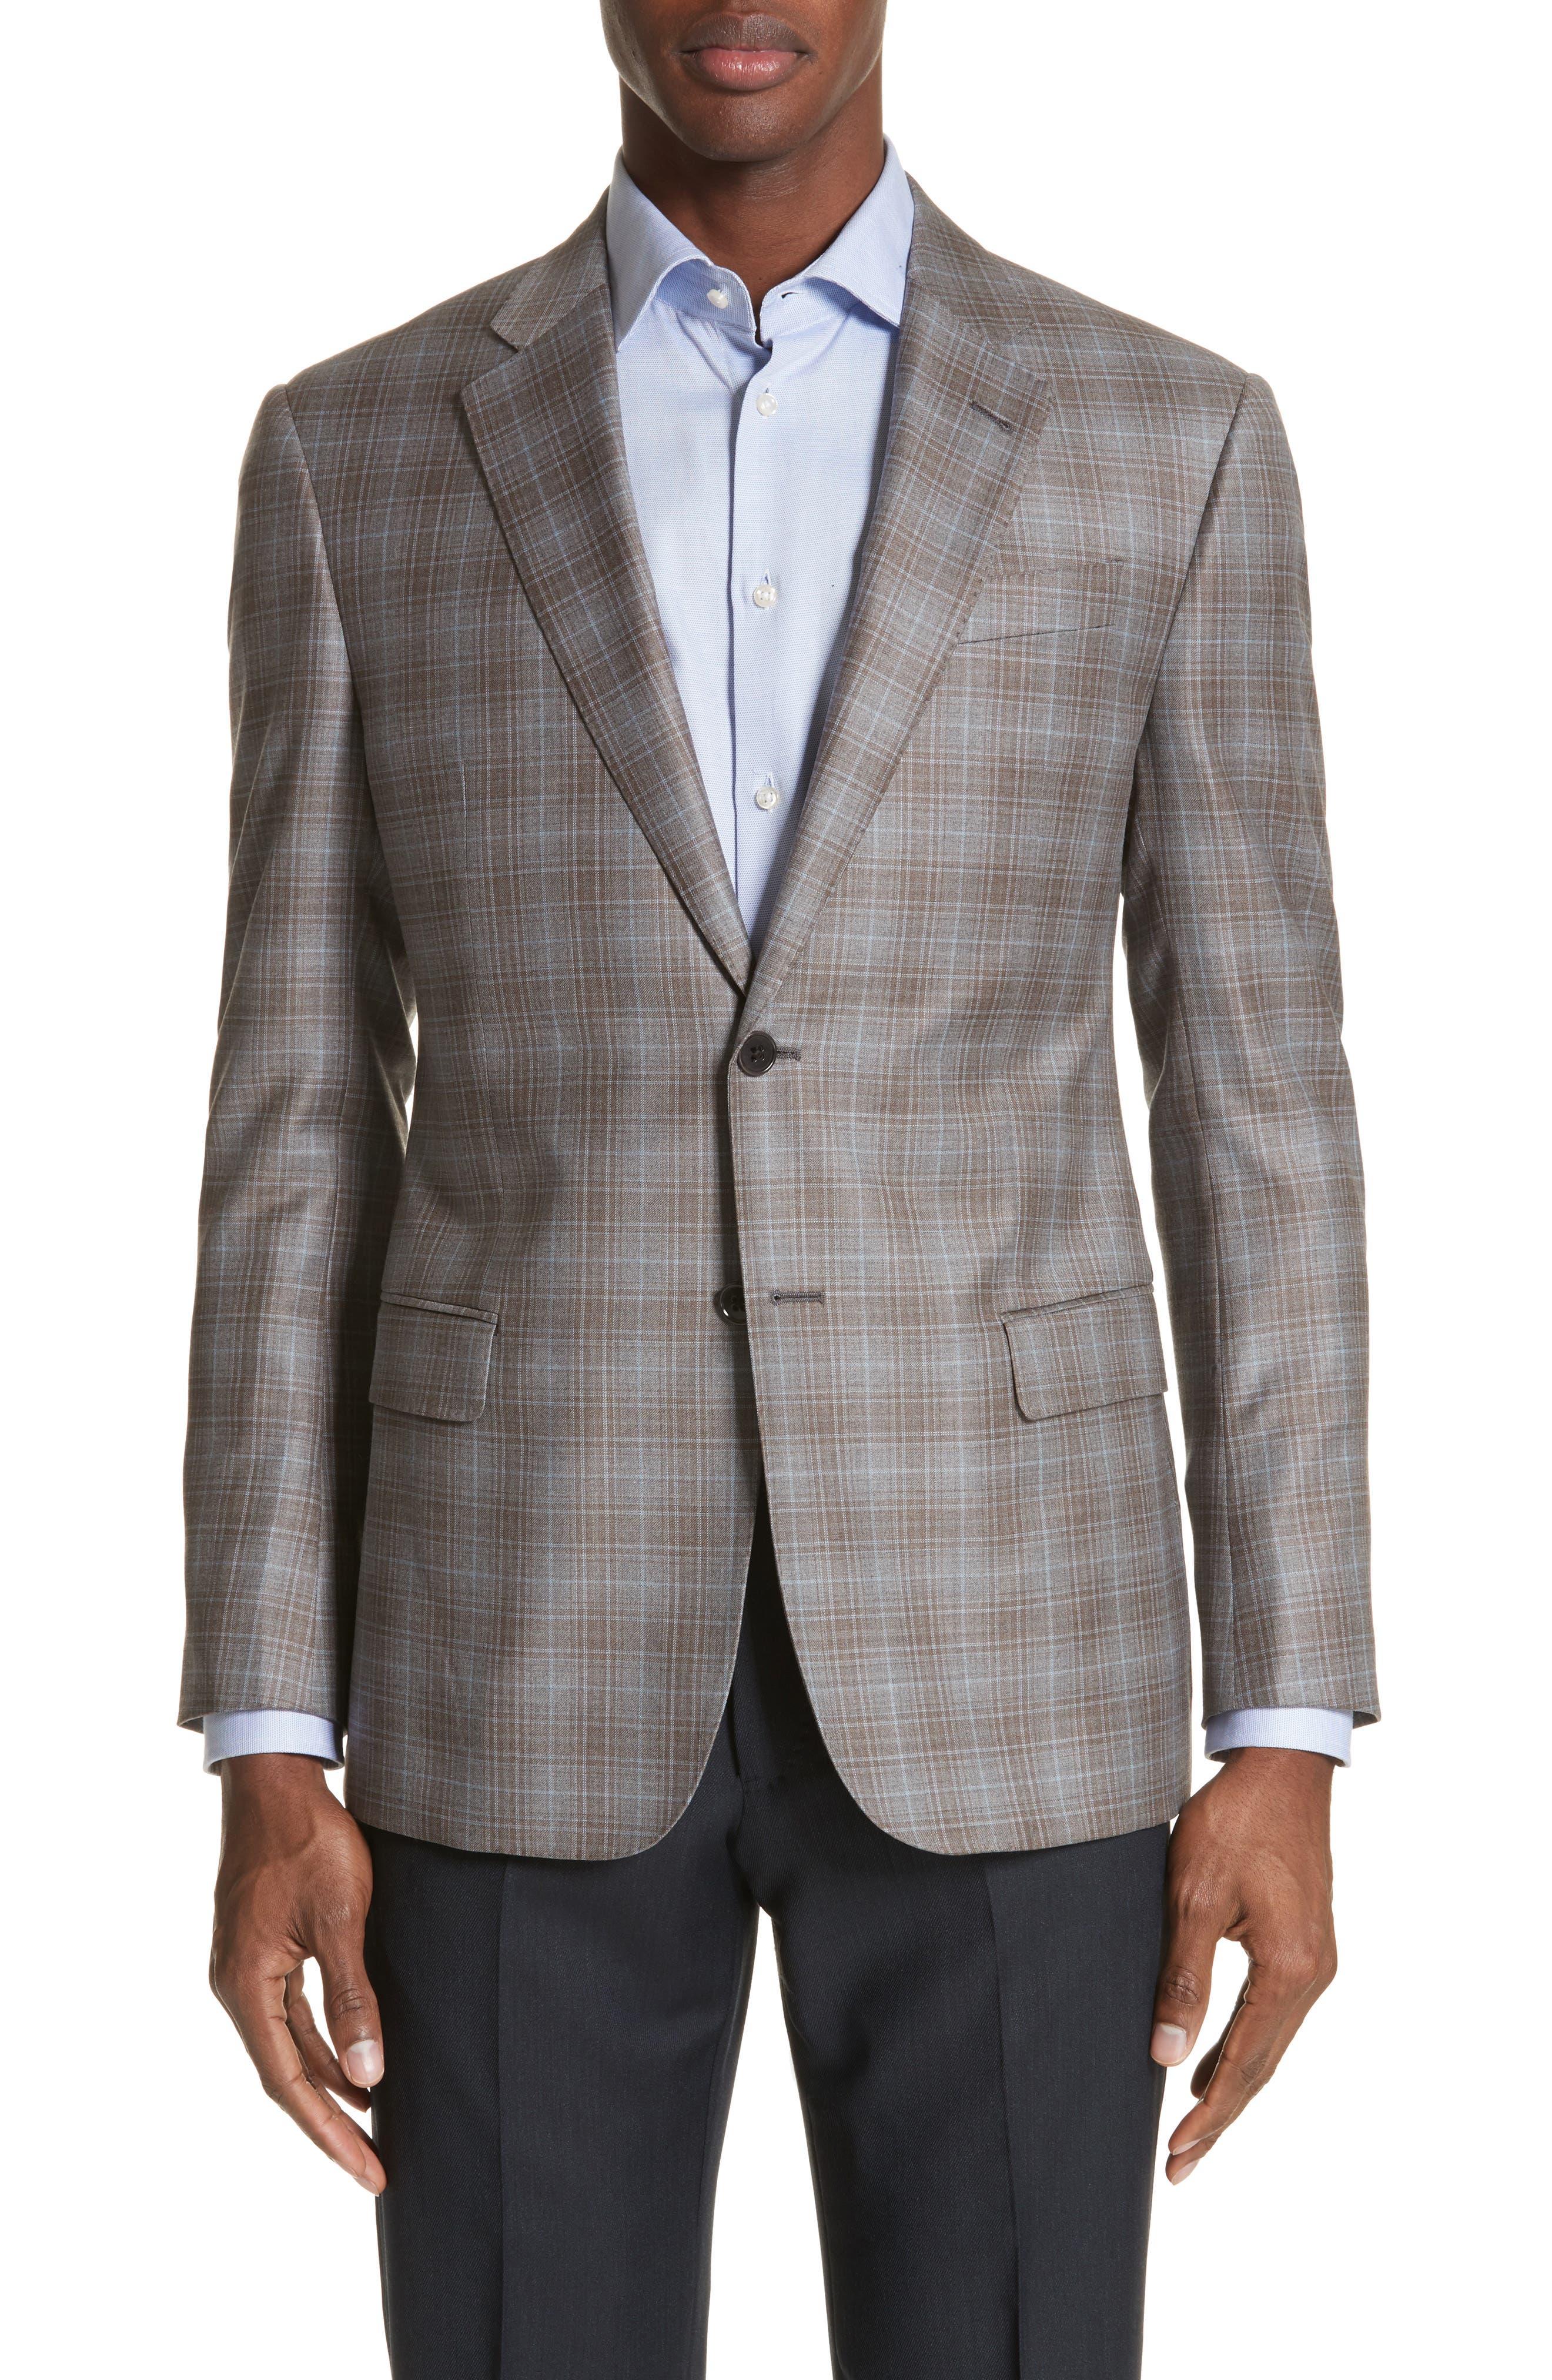 G-Line Trim Fit Plaid Wool Sport Coat,                             Main thumbnail 1, color,                             Tan